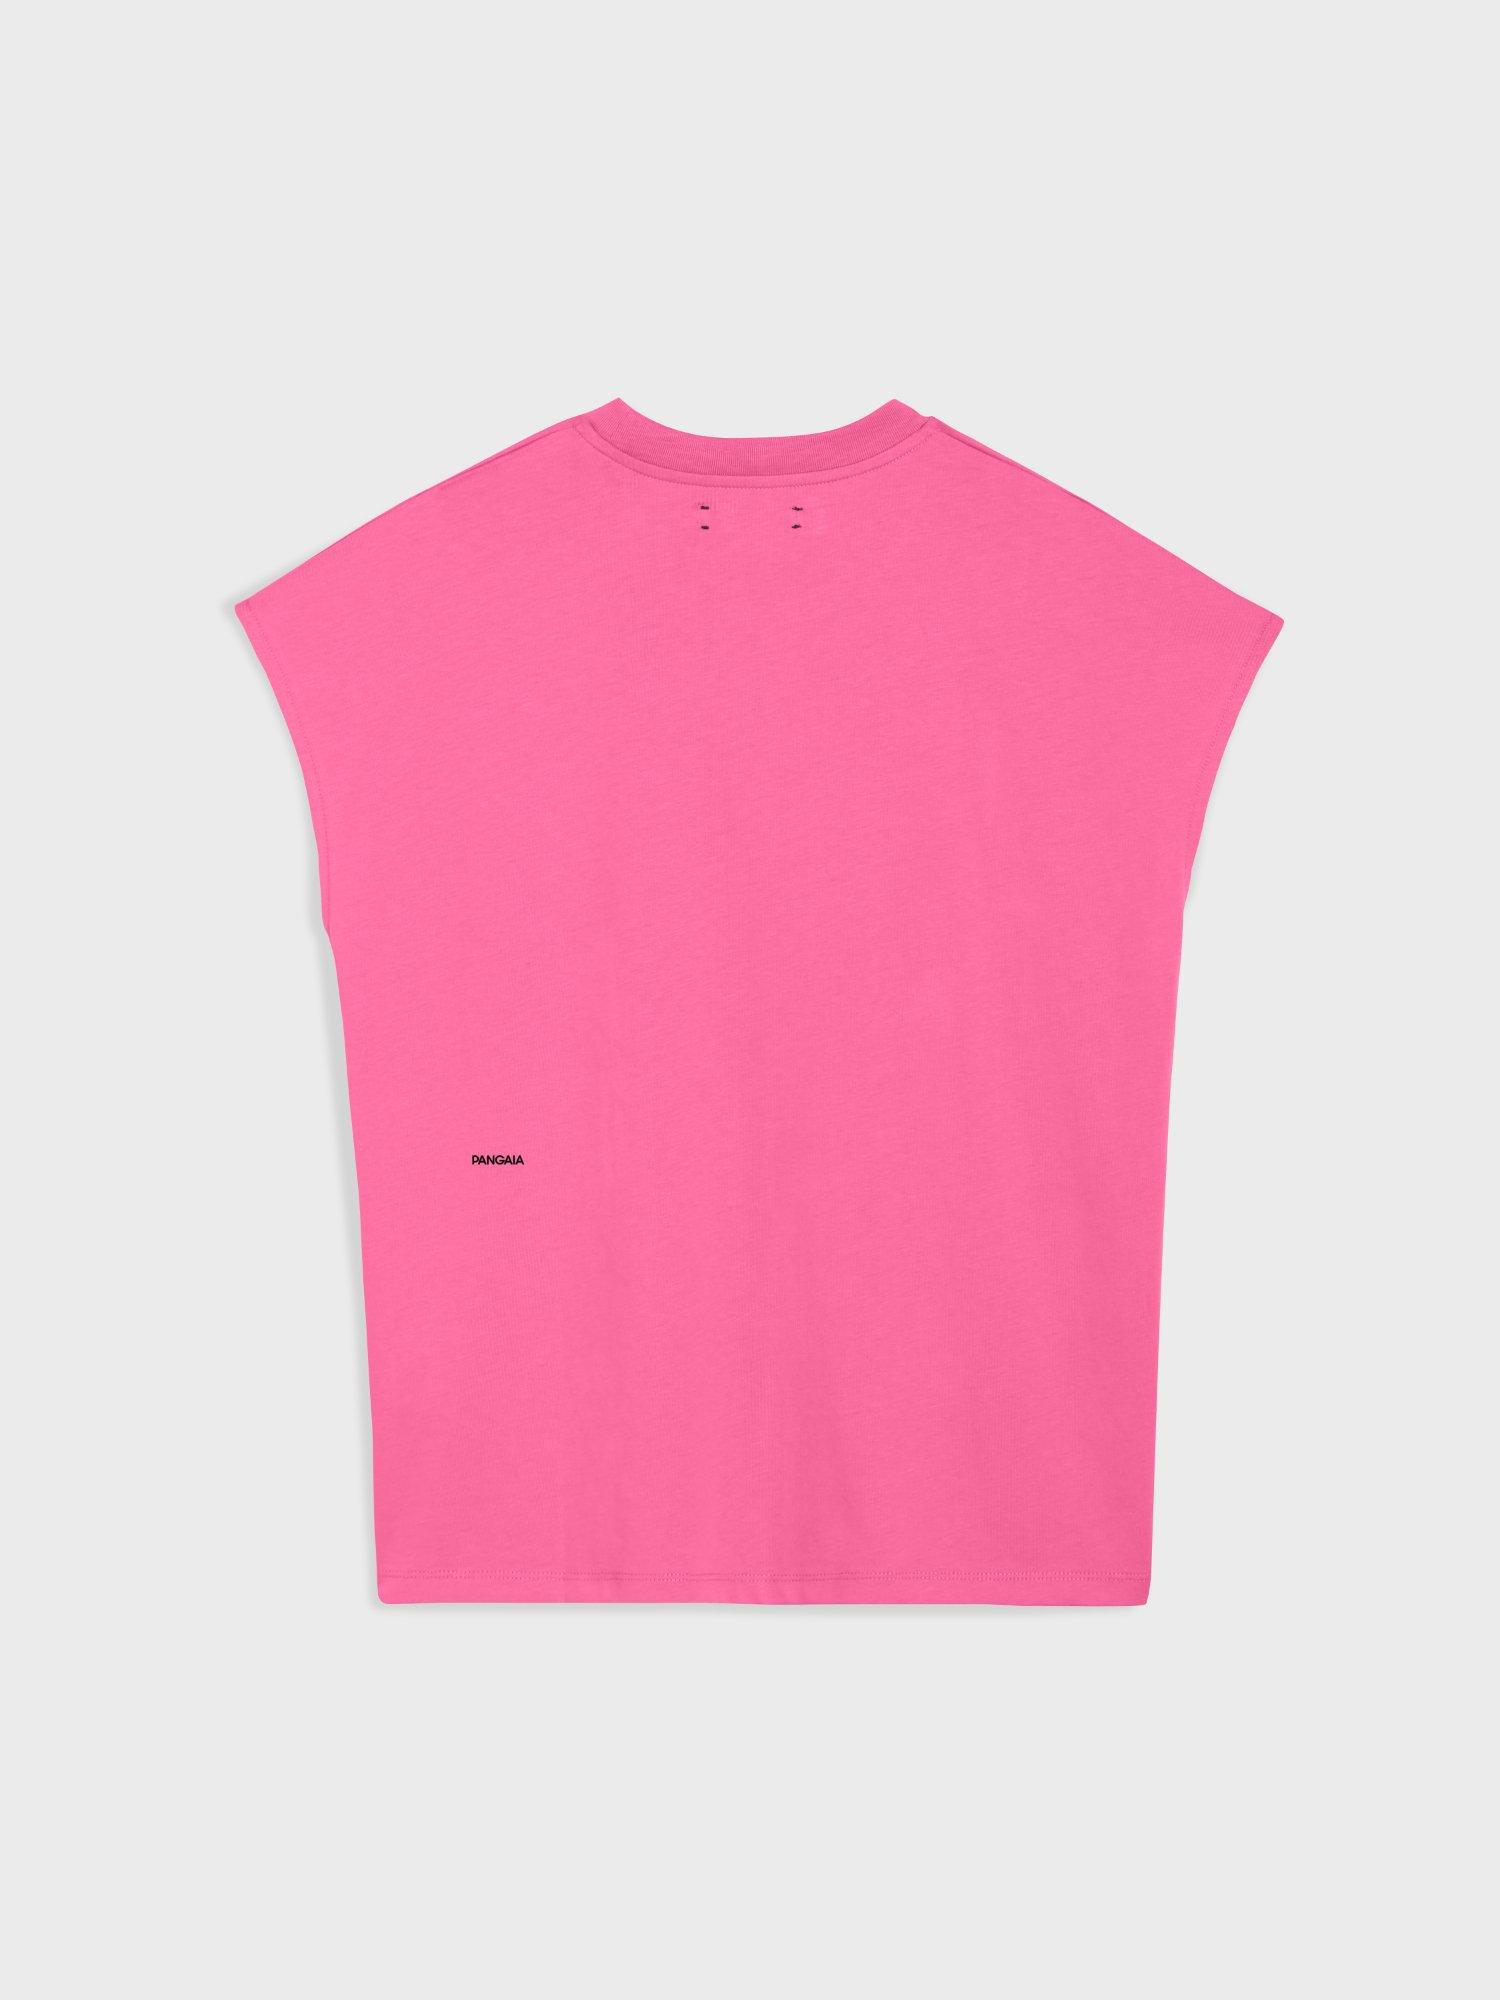 Pangaia PPRMINT™ Organic Cotton Cropped Shoulder T-shirt